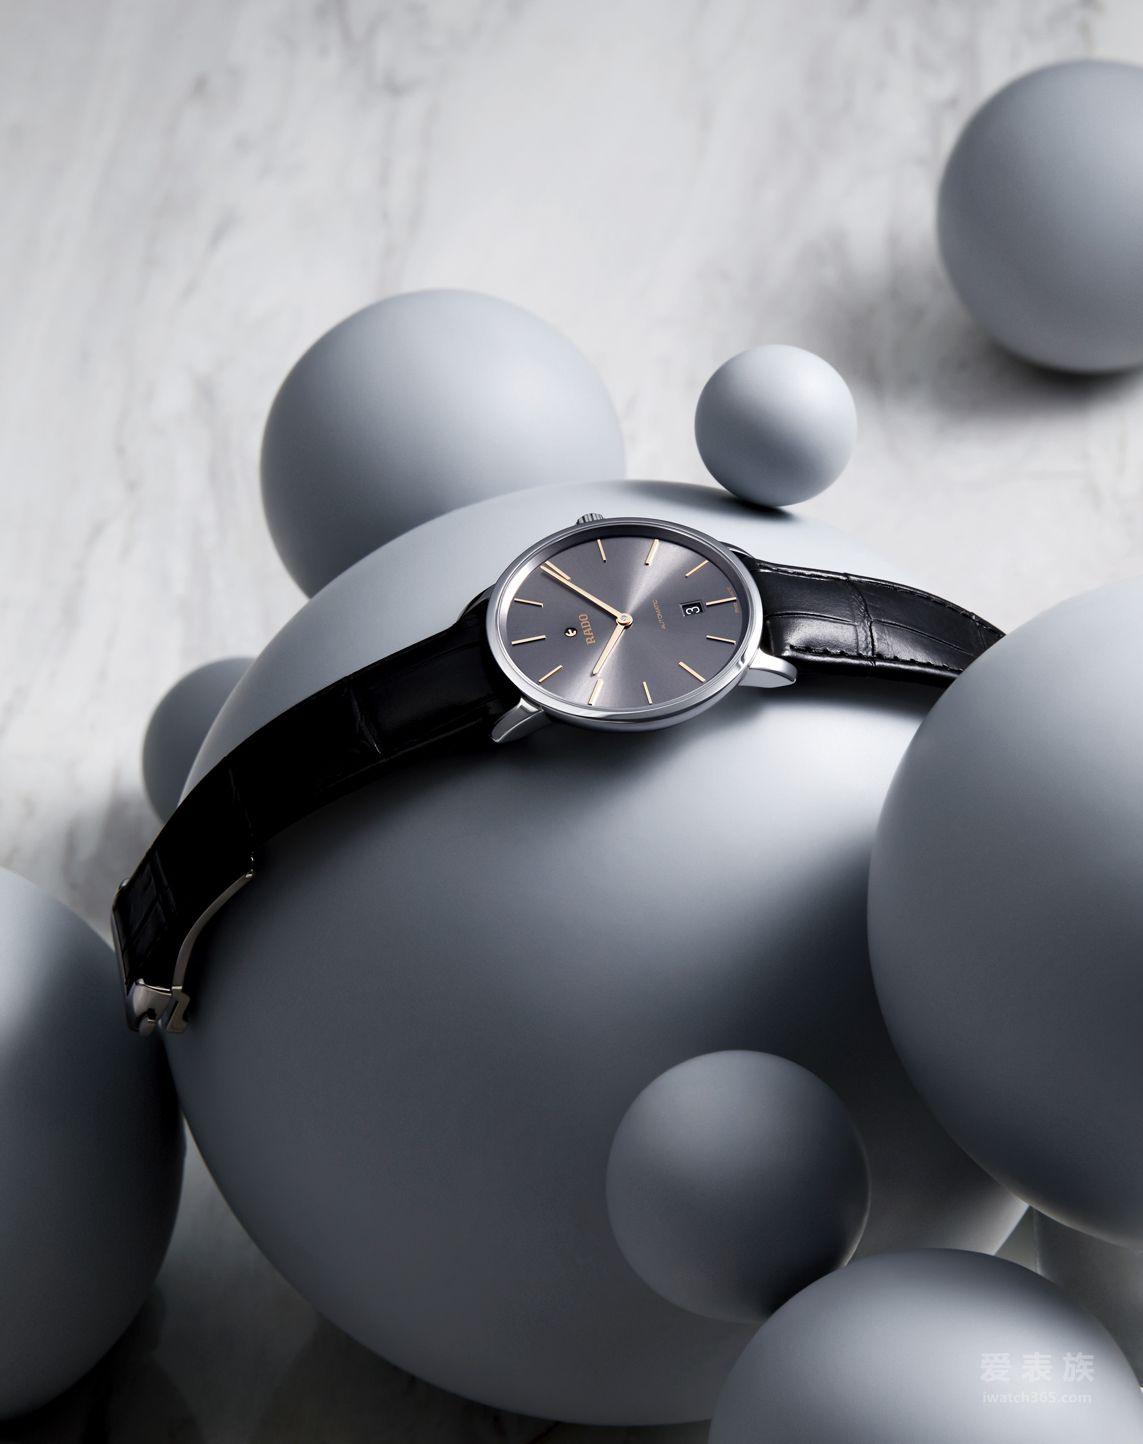 RADO瑞士雷达表DiaMaster钻霸系列CERAMOS™金属陶瓷自动机械腕表情境图10-23